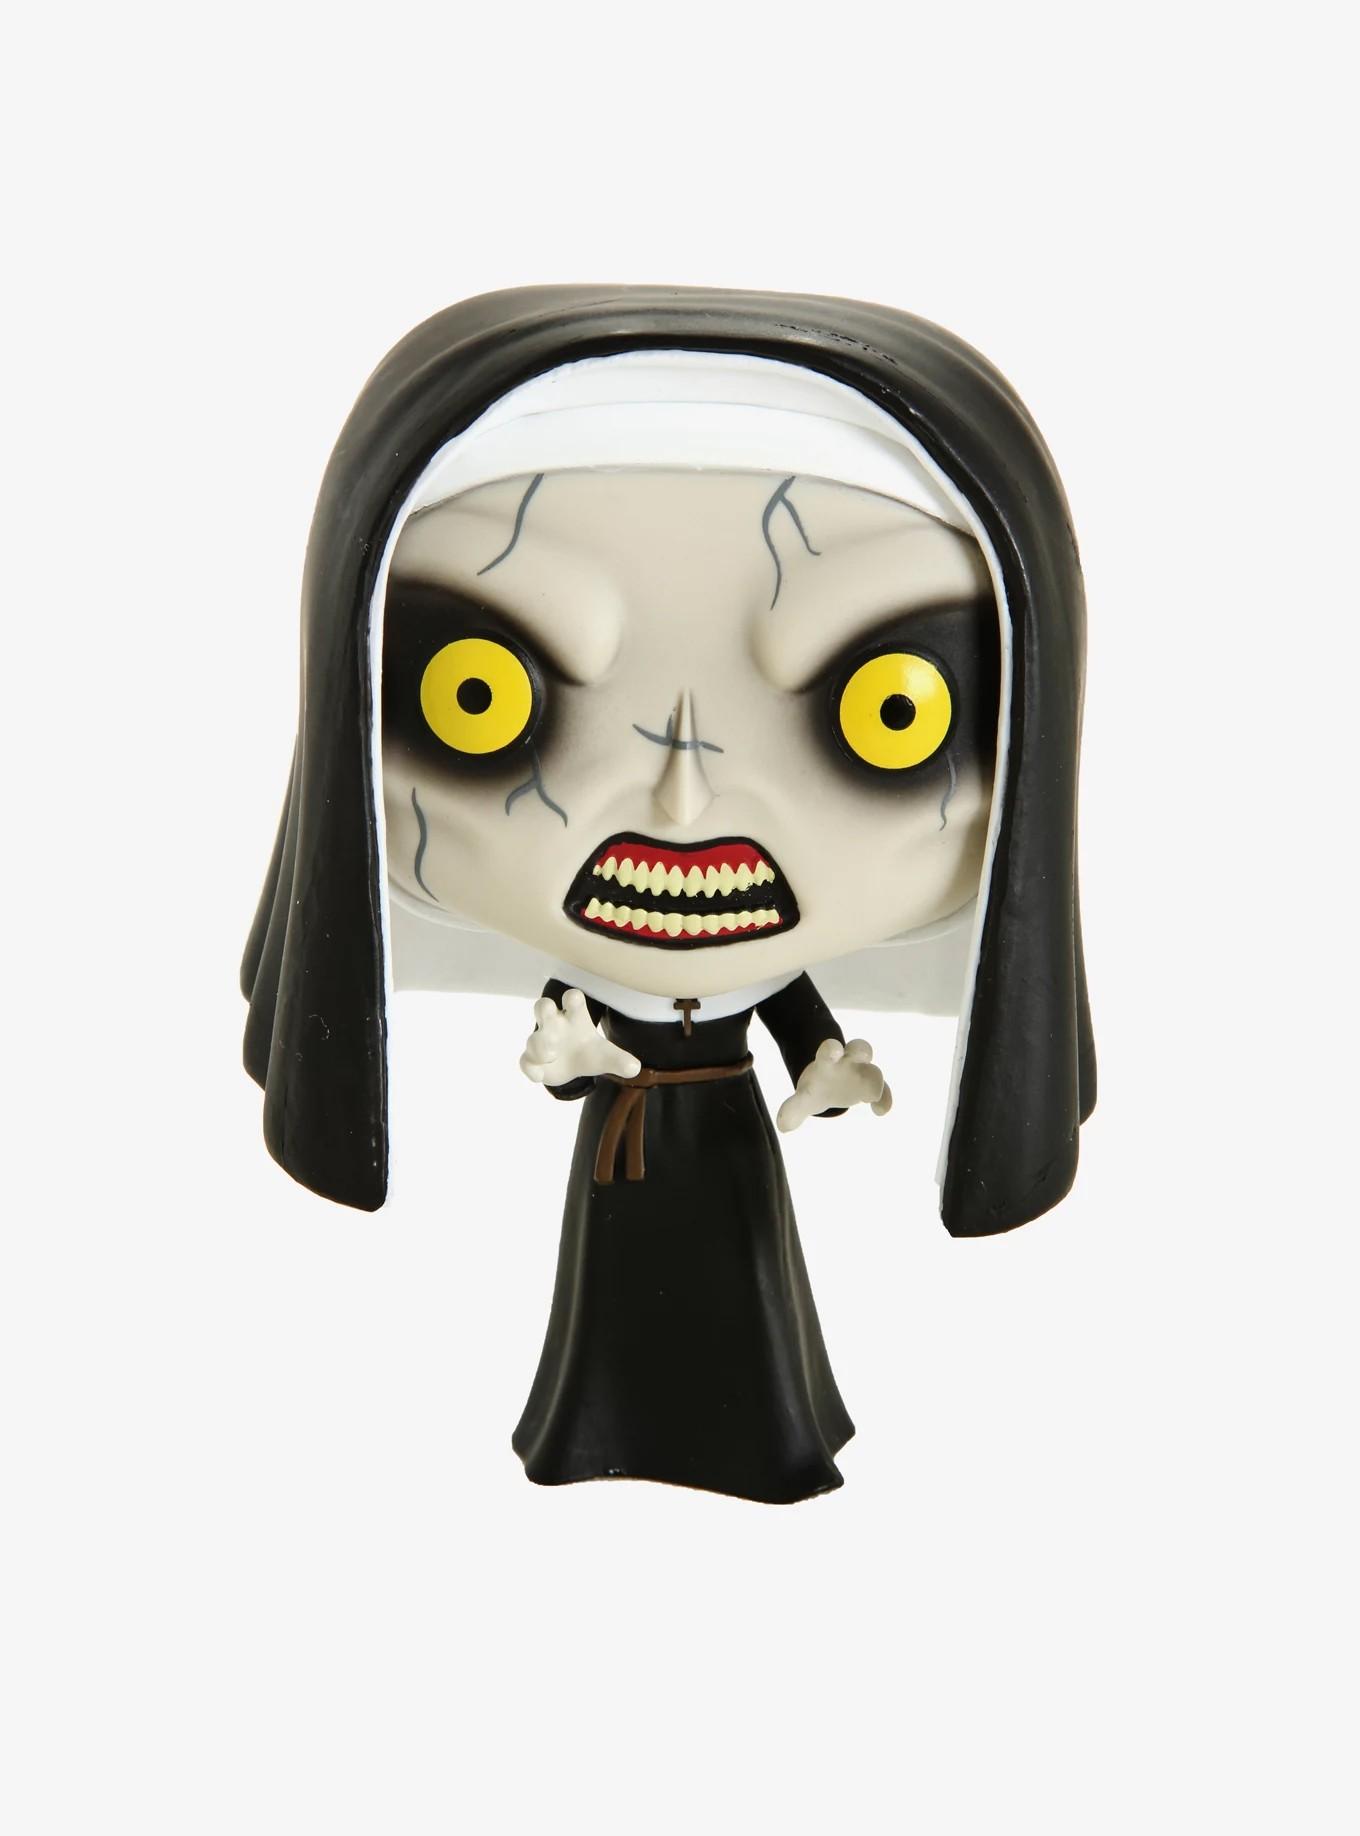 The Nun (Demoniac) #776 - Funko Pop! Movies